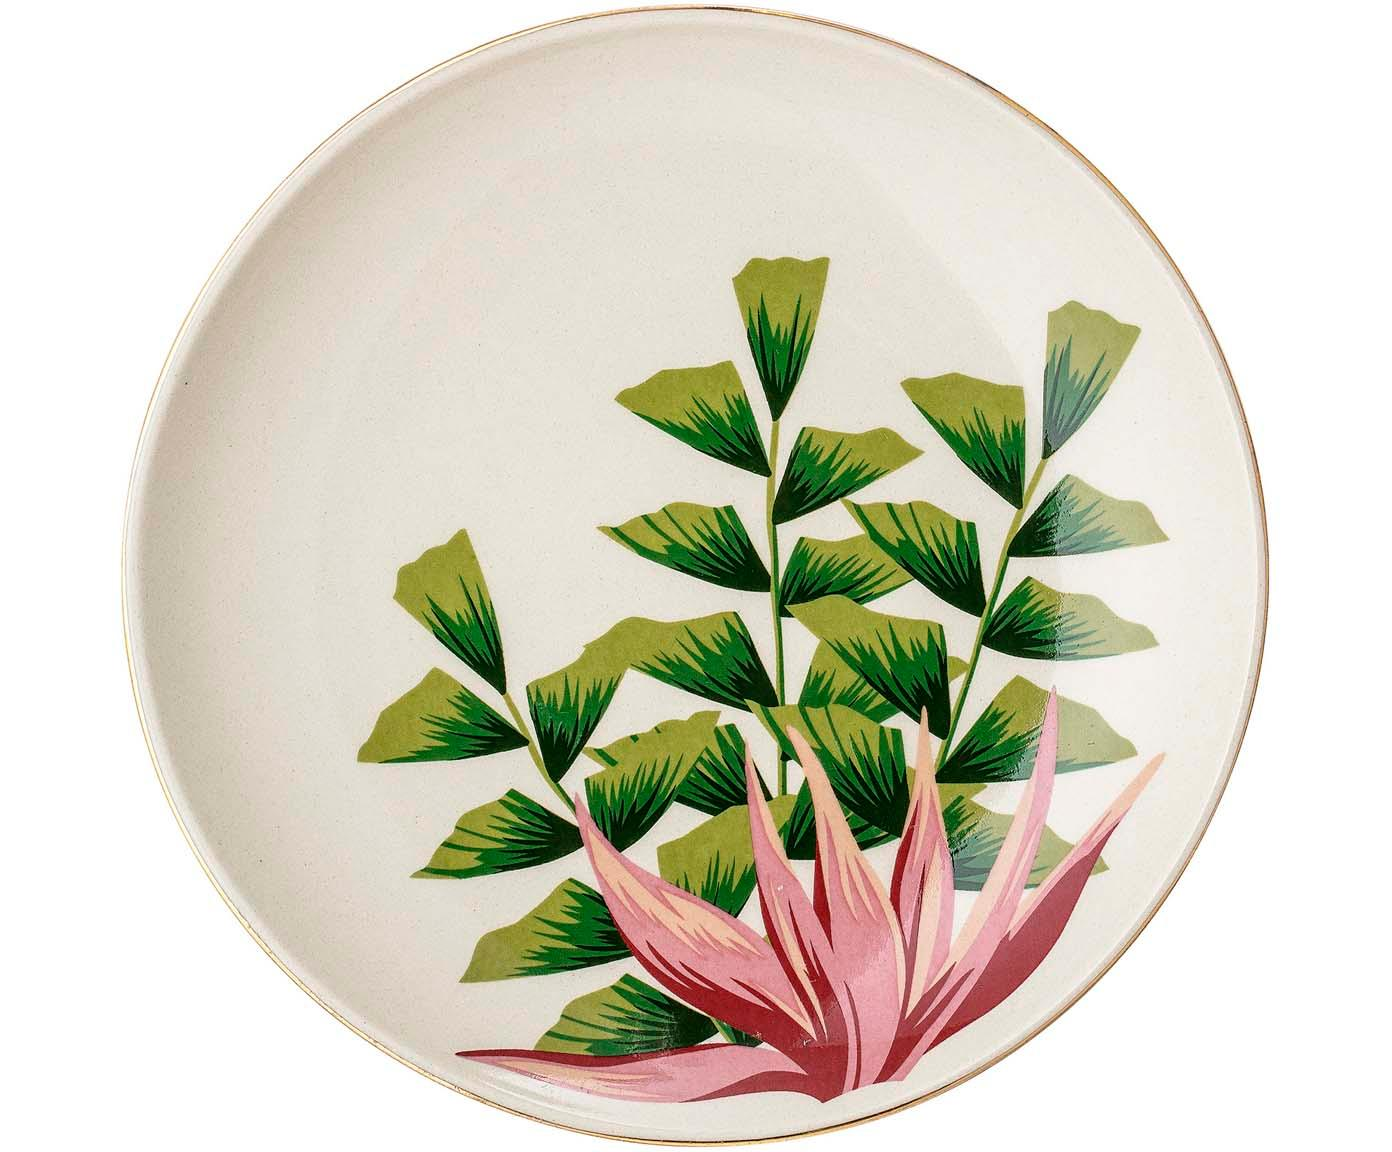 Plato postre Moana, Gres, Blanco, verde, rosa, Ø 16 cm